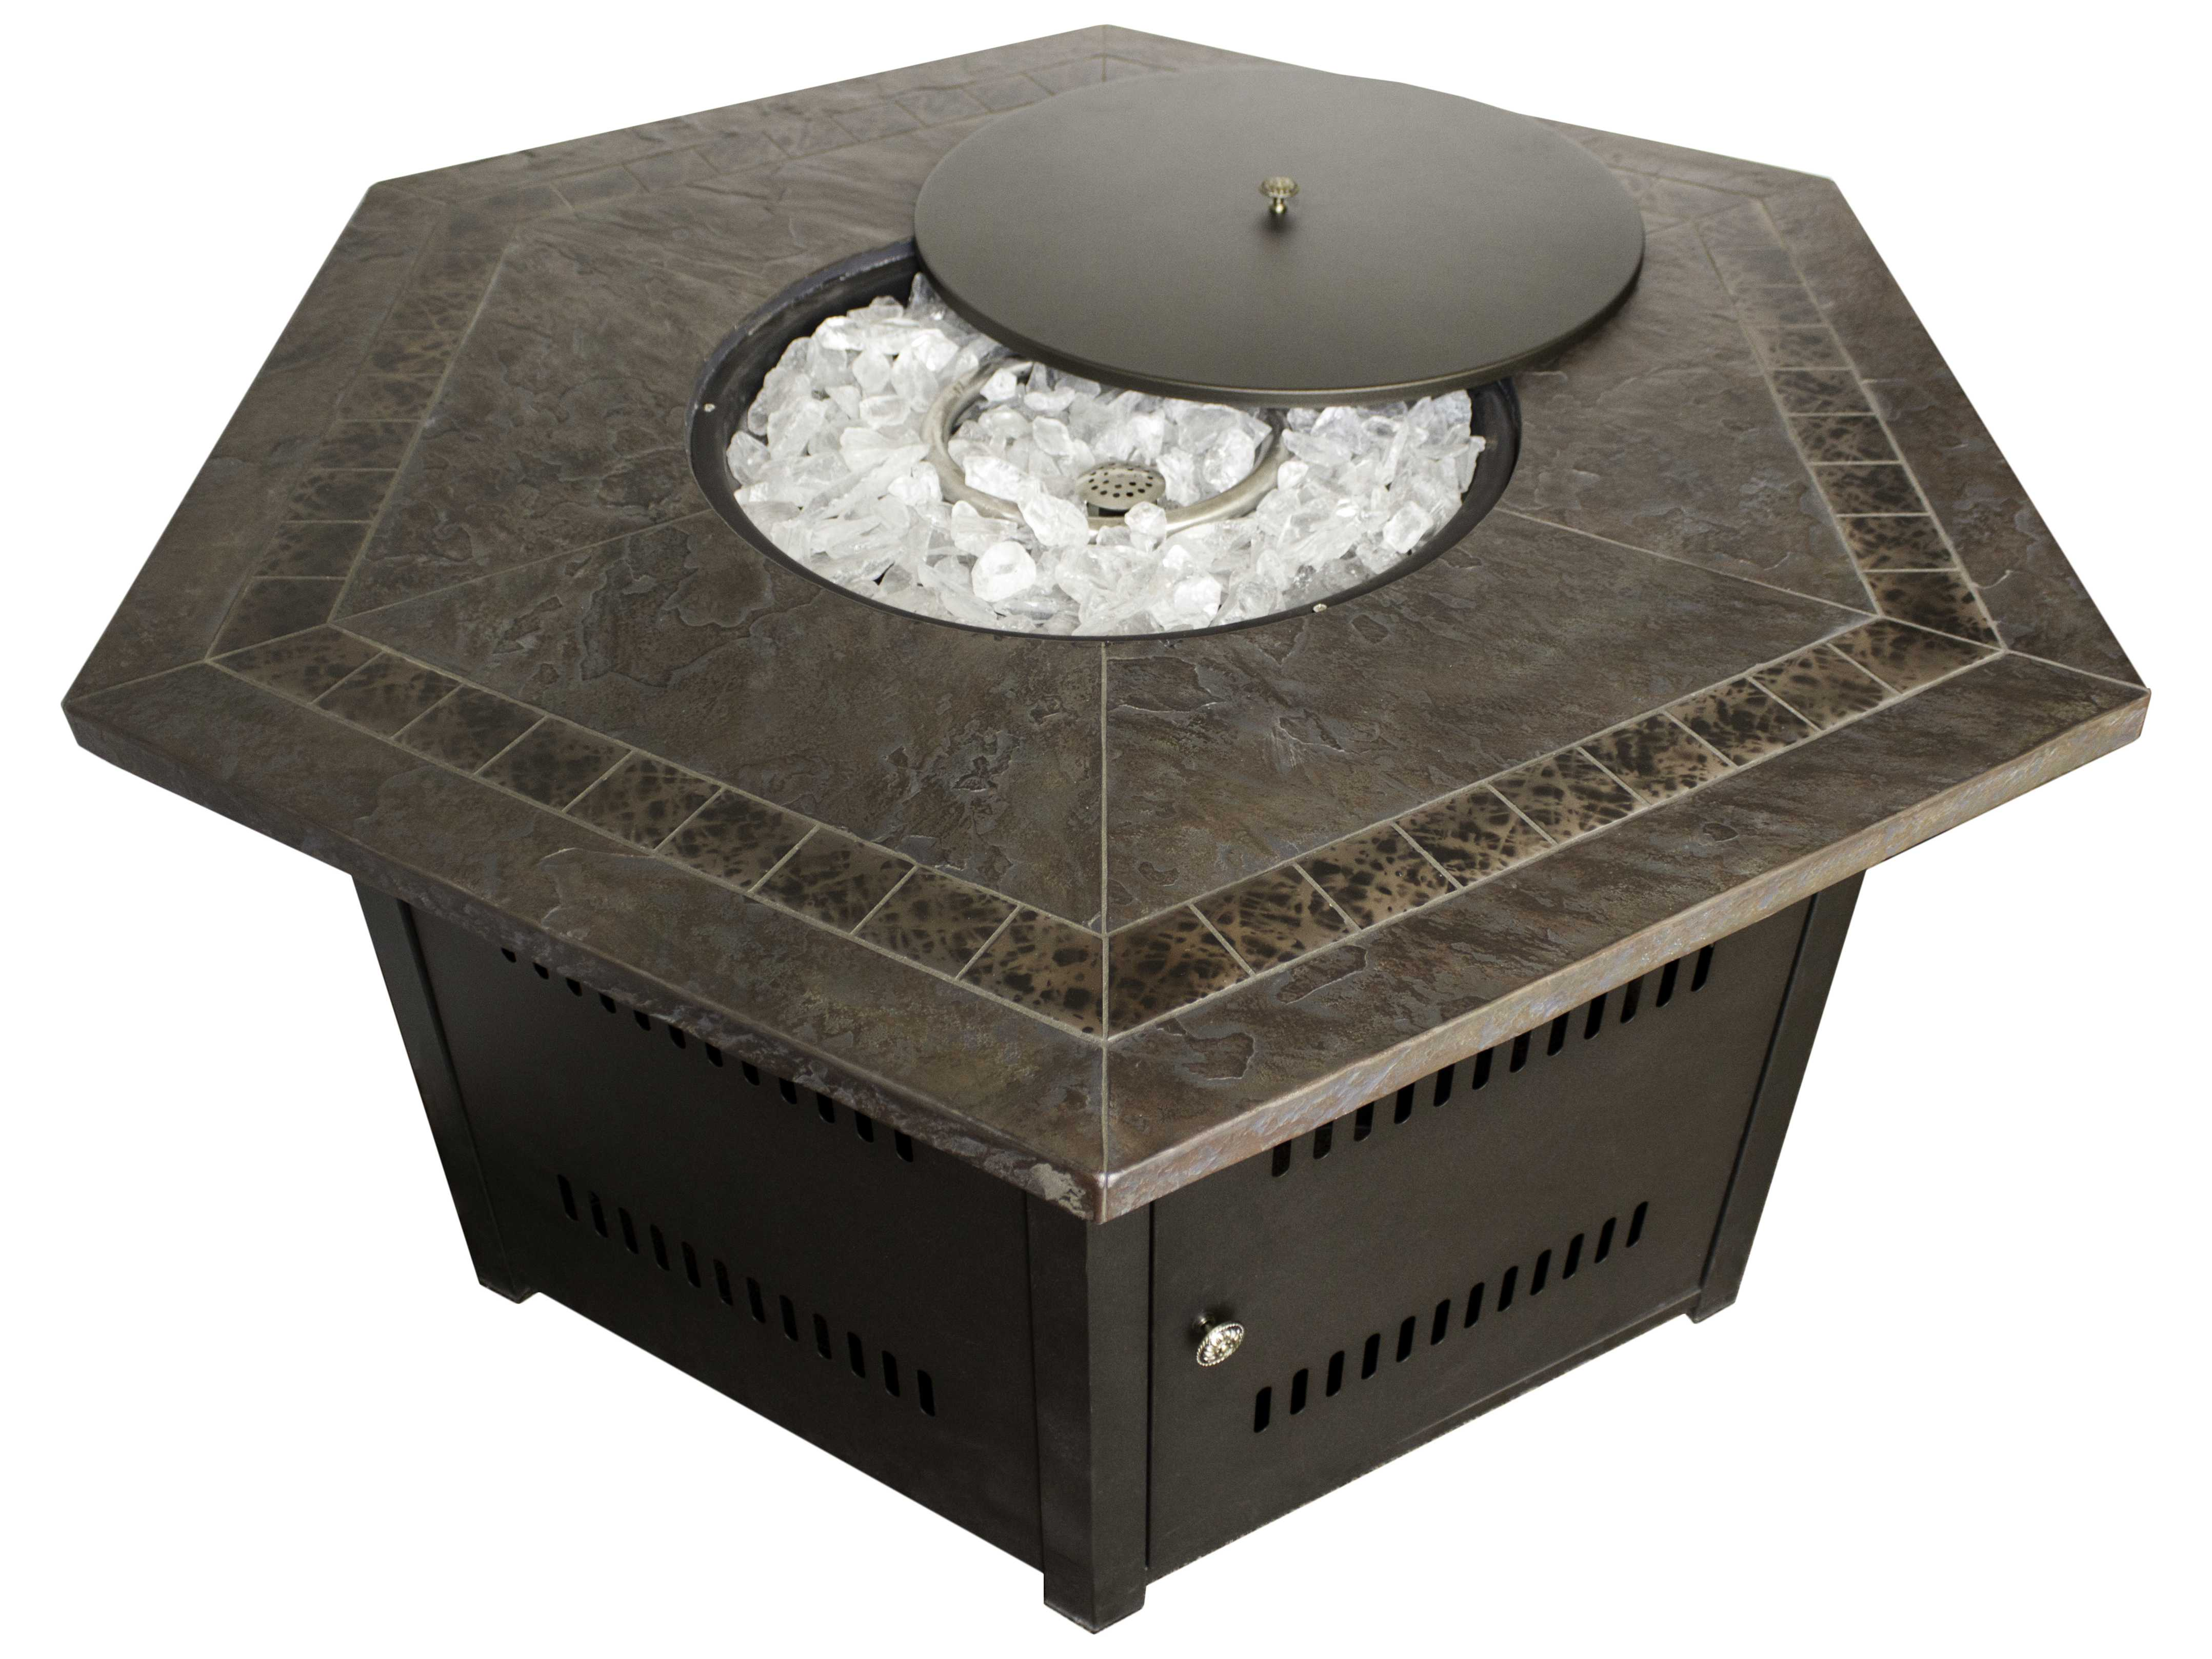 Az patio heaters hexagon firepit faux stone top azwlfhex for Az patio heaters fire pit